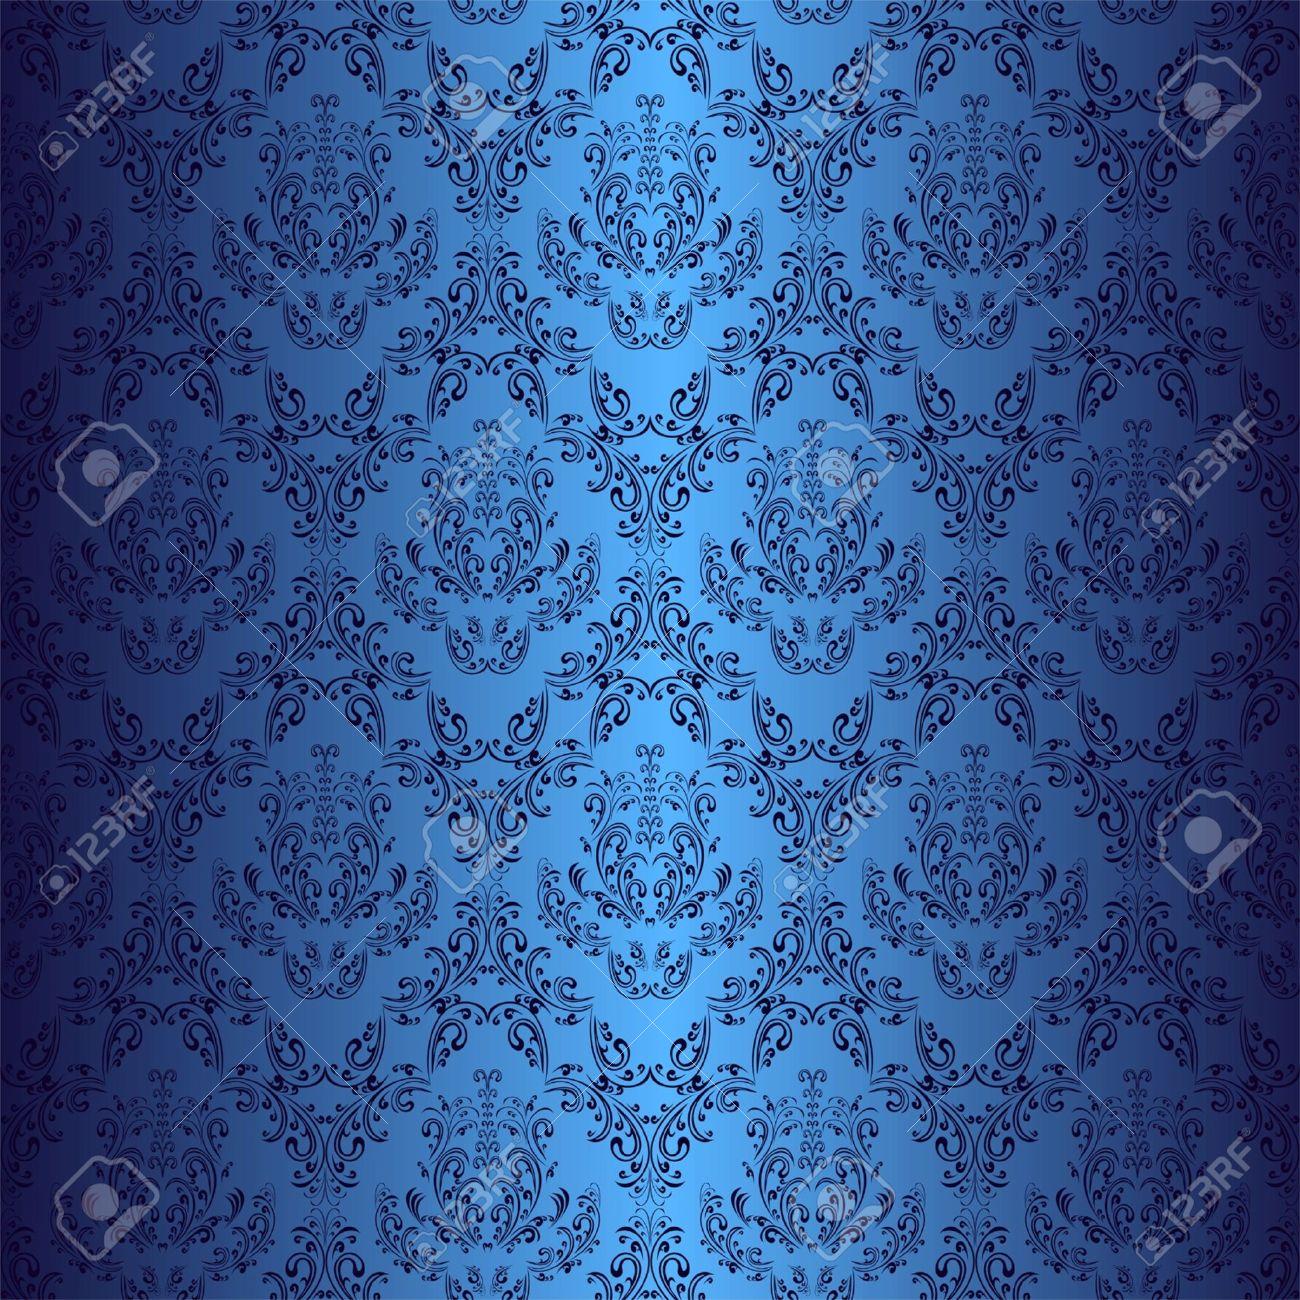 Seamless dark blue wallpaper in style retro - 16133525